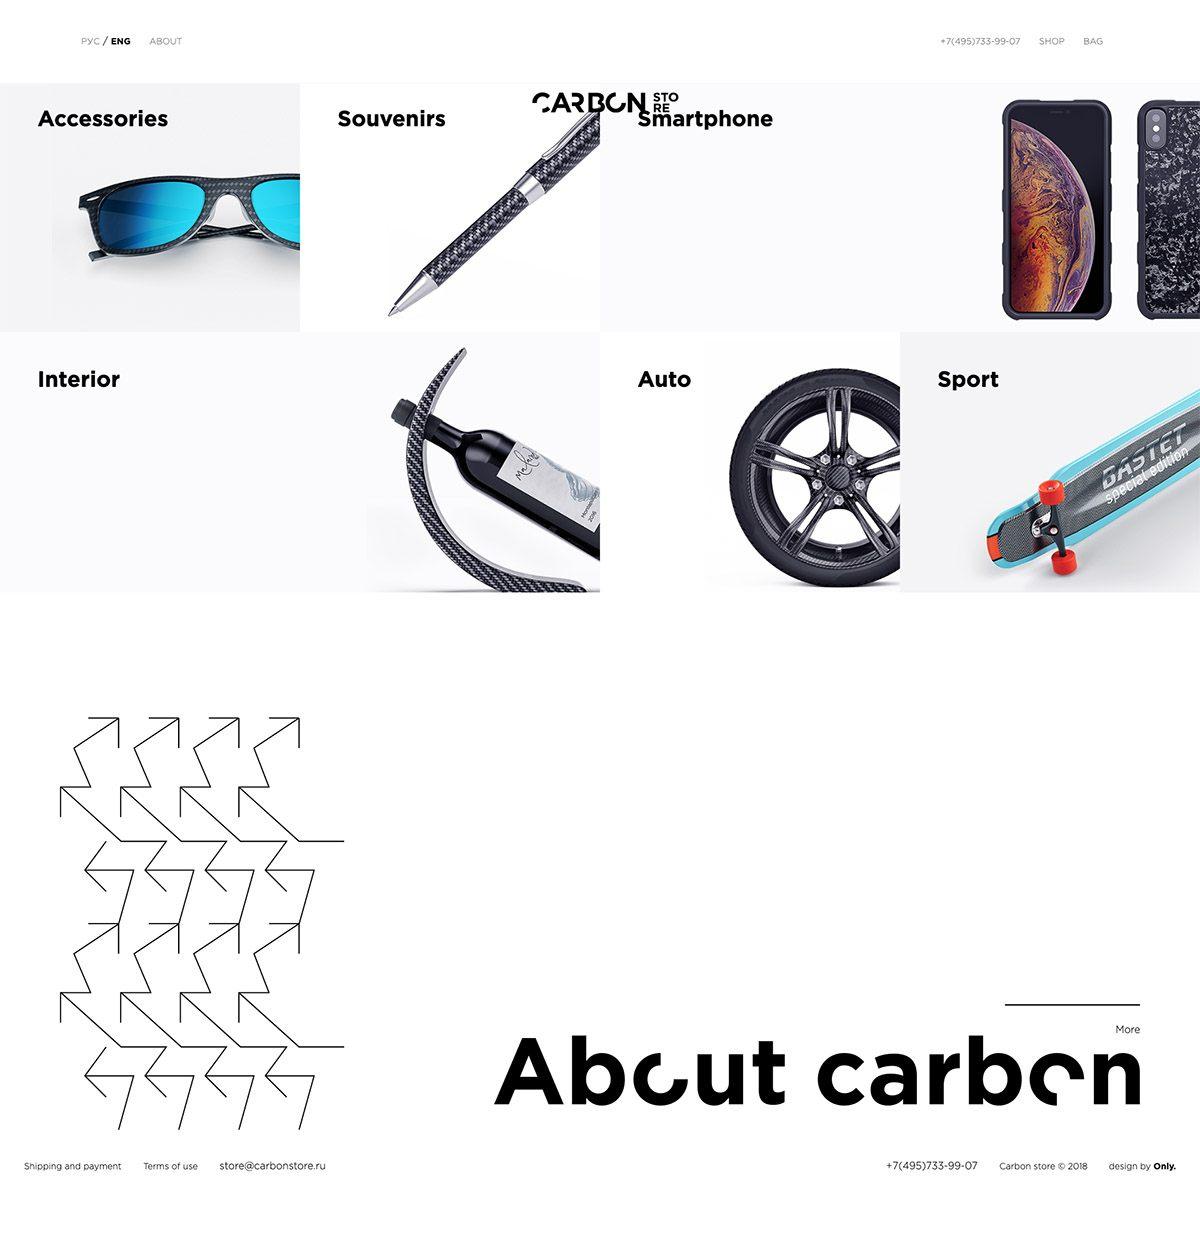 eCommerce website: Carbonstore